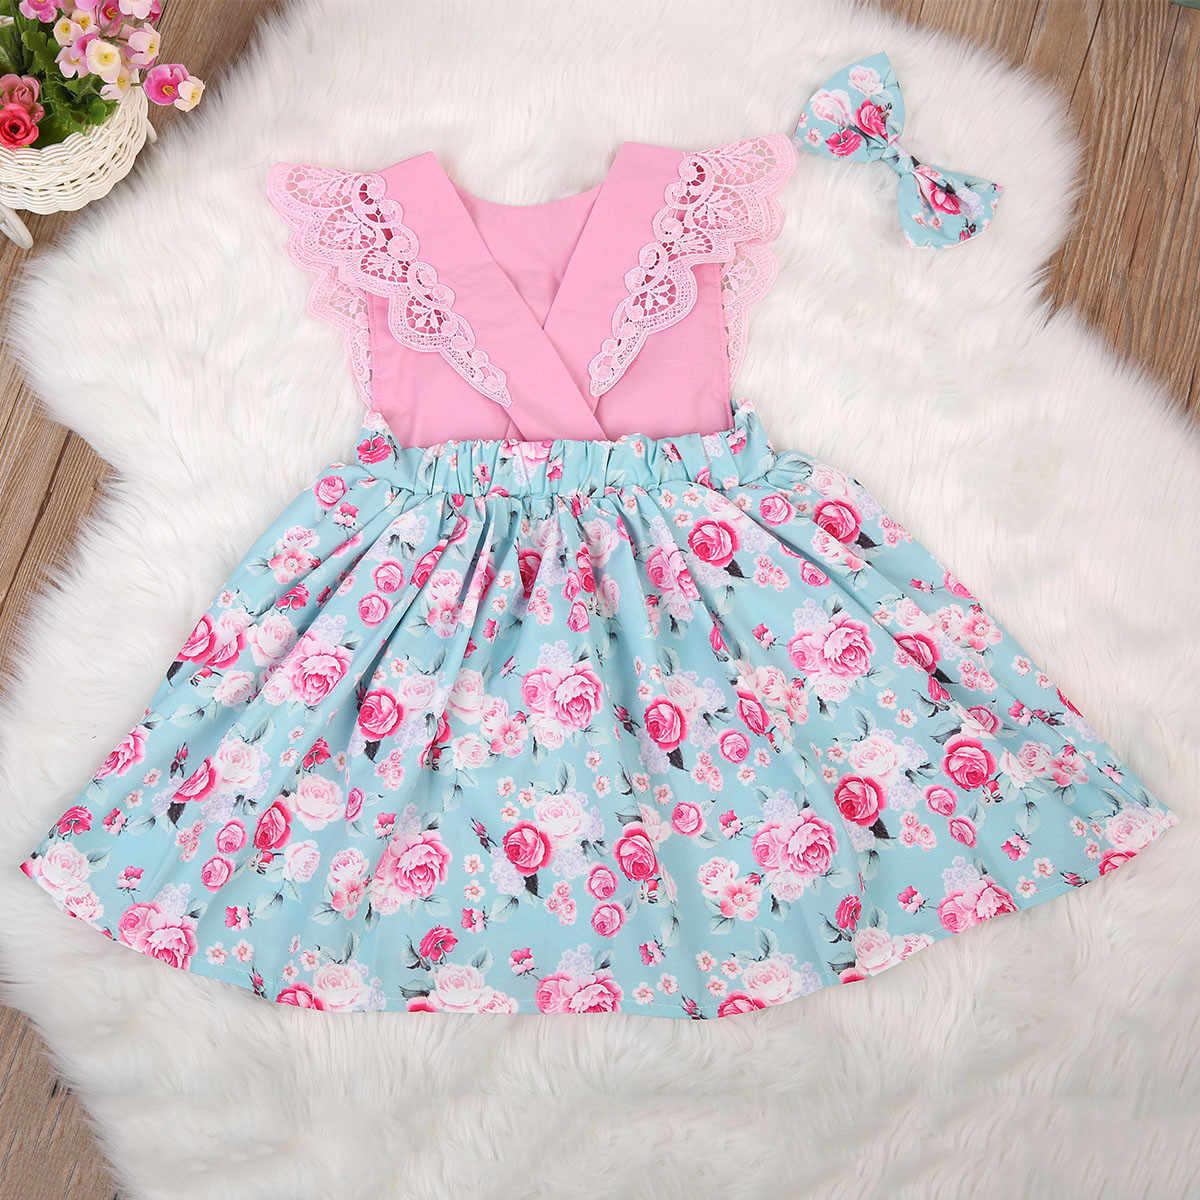 7a28dbfdb ... Super Cute 3 Styles Baby girl Floral Pink Bodysuits with Skirt Babies  Girl Halter Flower Summer